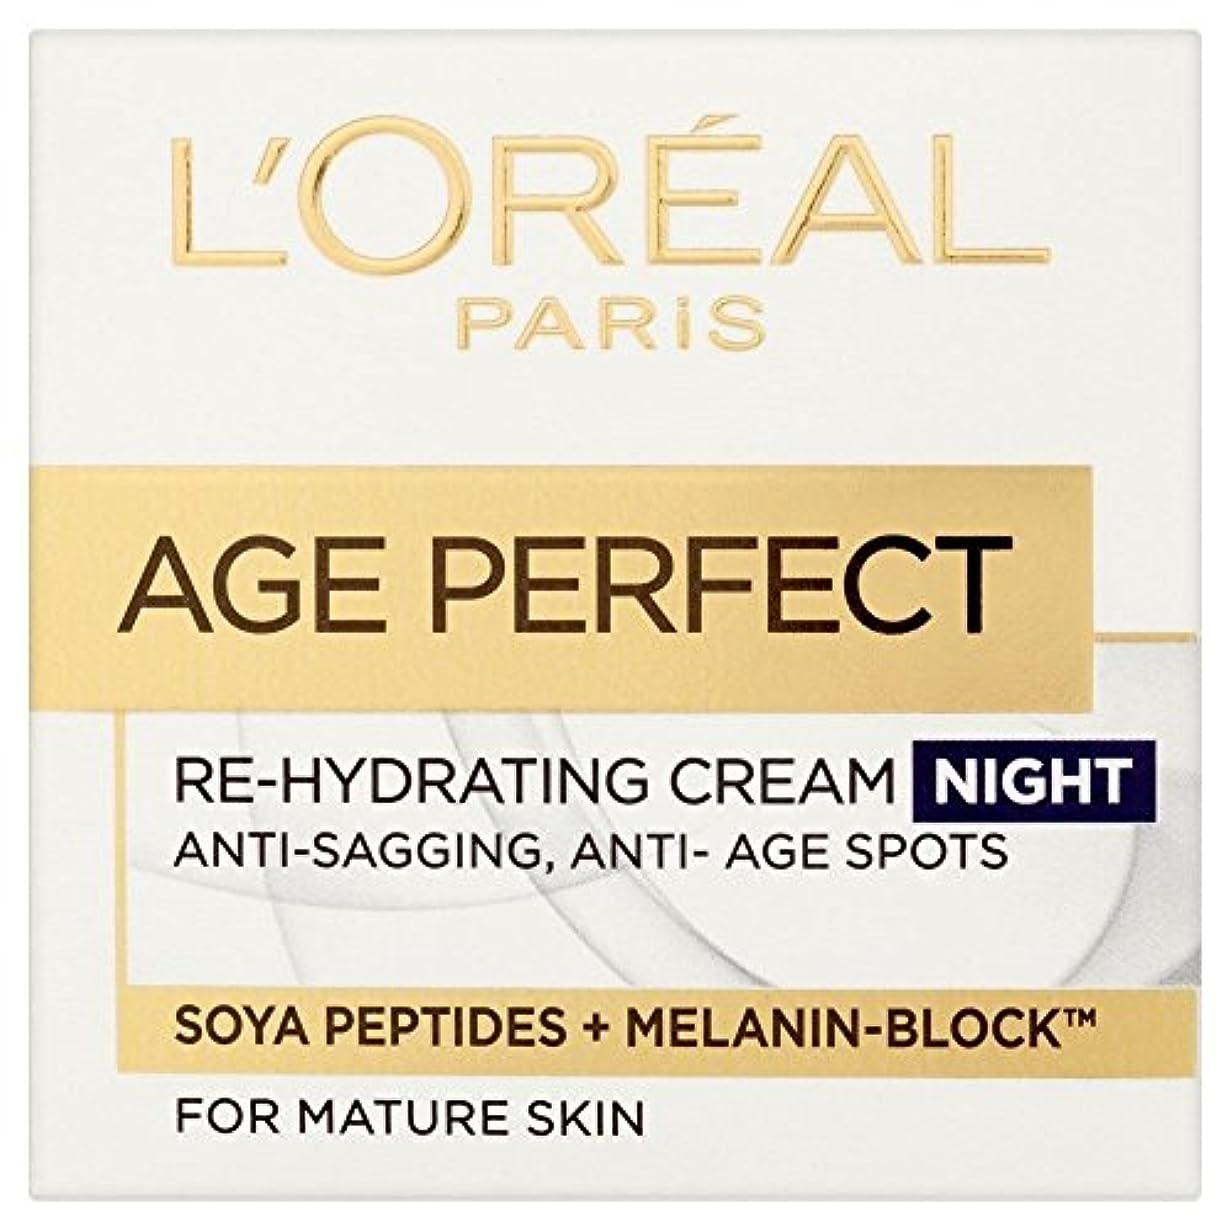 ブラウズモーテル一回L'Oréal Paris Alter Perfekte Pro-Calcium-Stärkende Nachtcreme 50 Ml - Packung mit 2